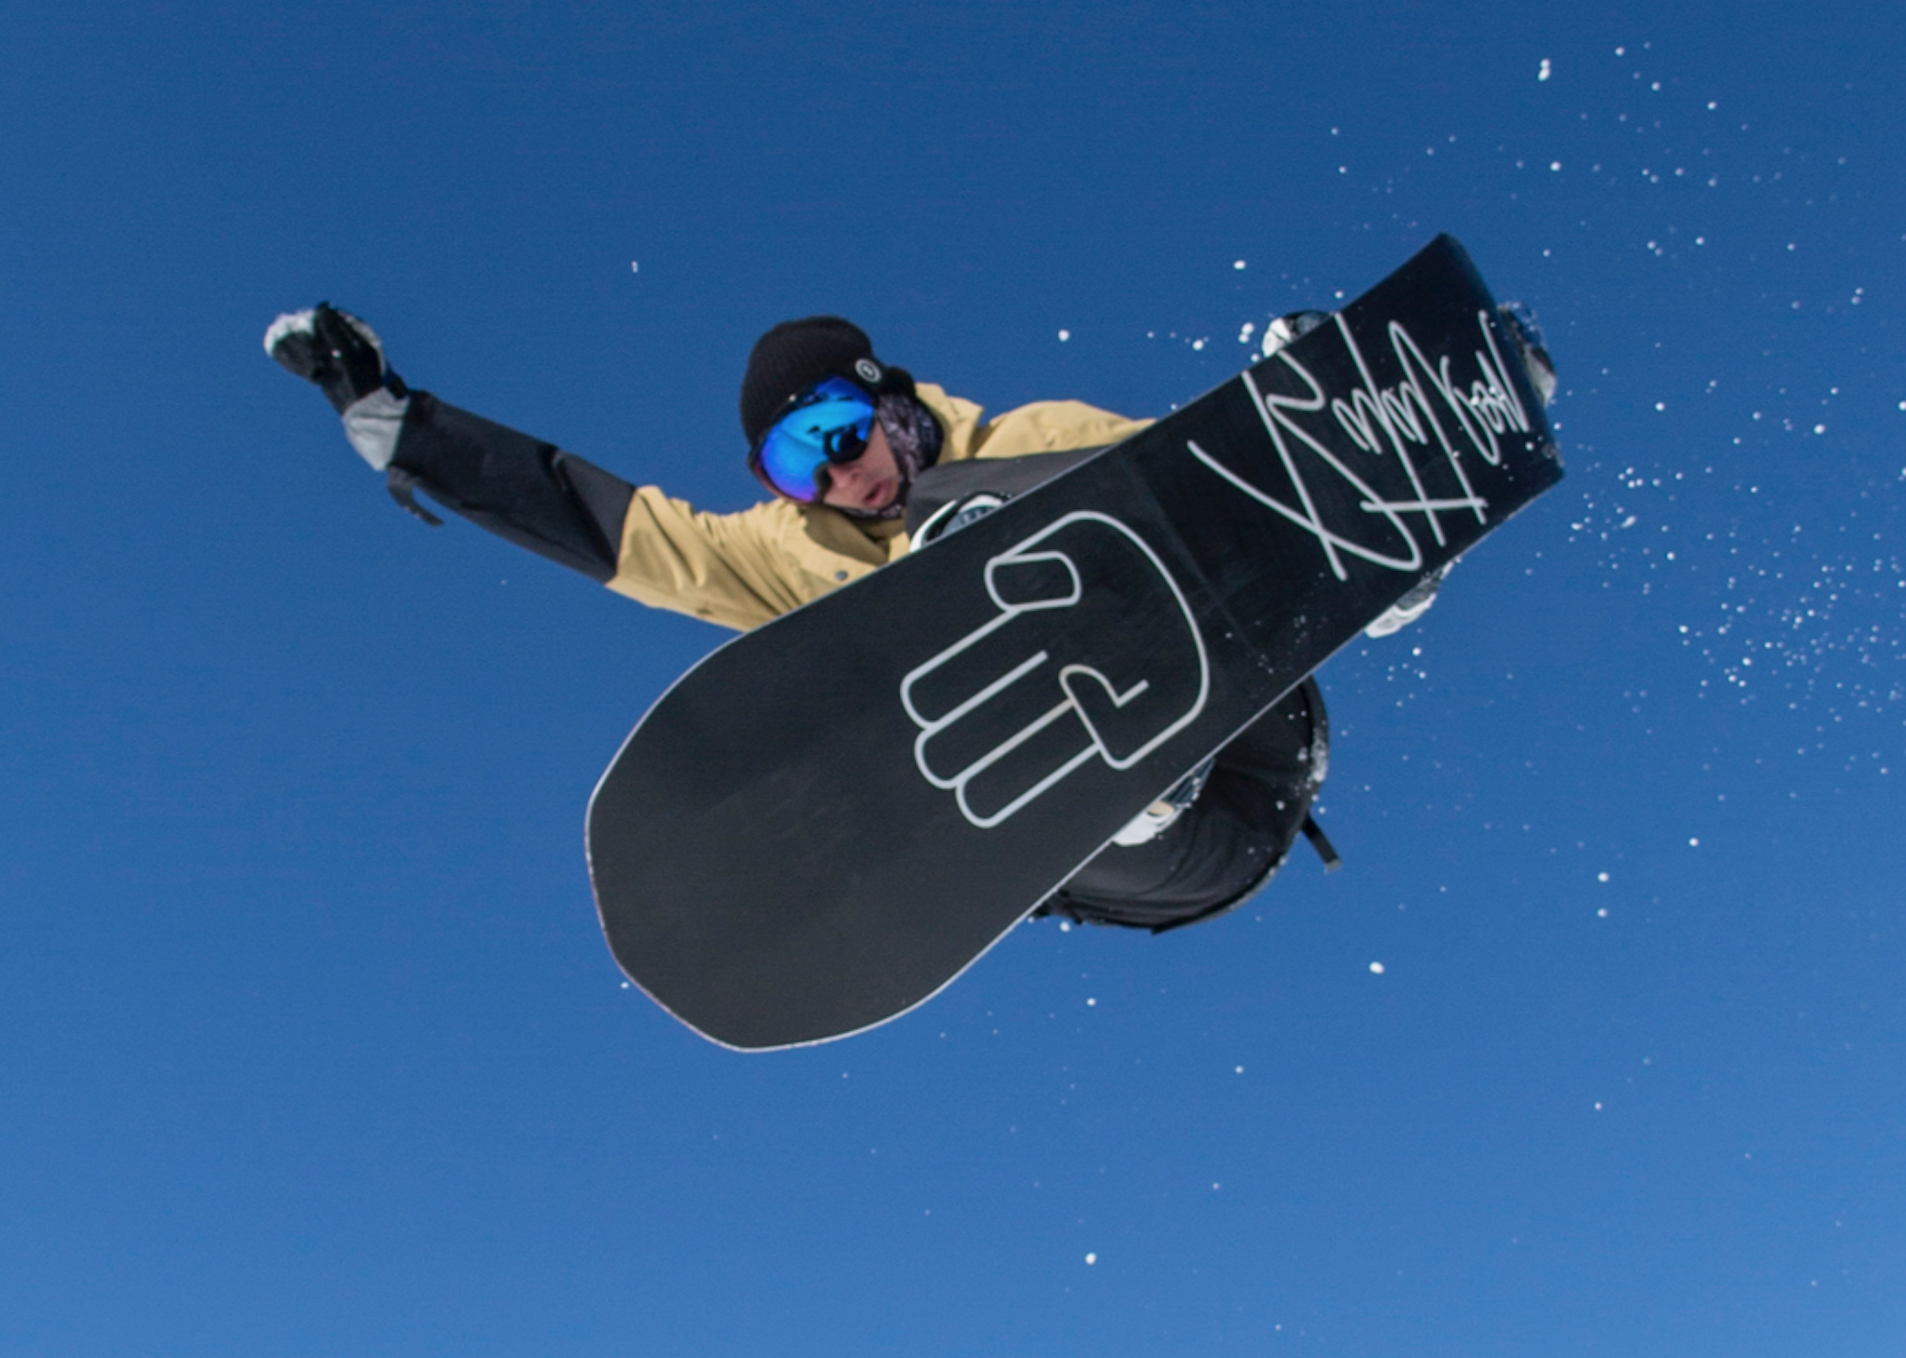 24ebe97a5ca6 Men s Snowboarding Gear - The Snowboard Asylum